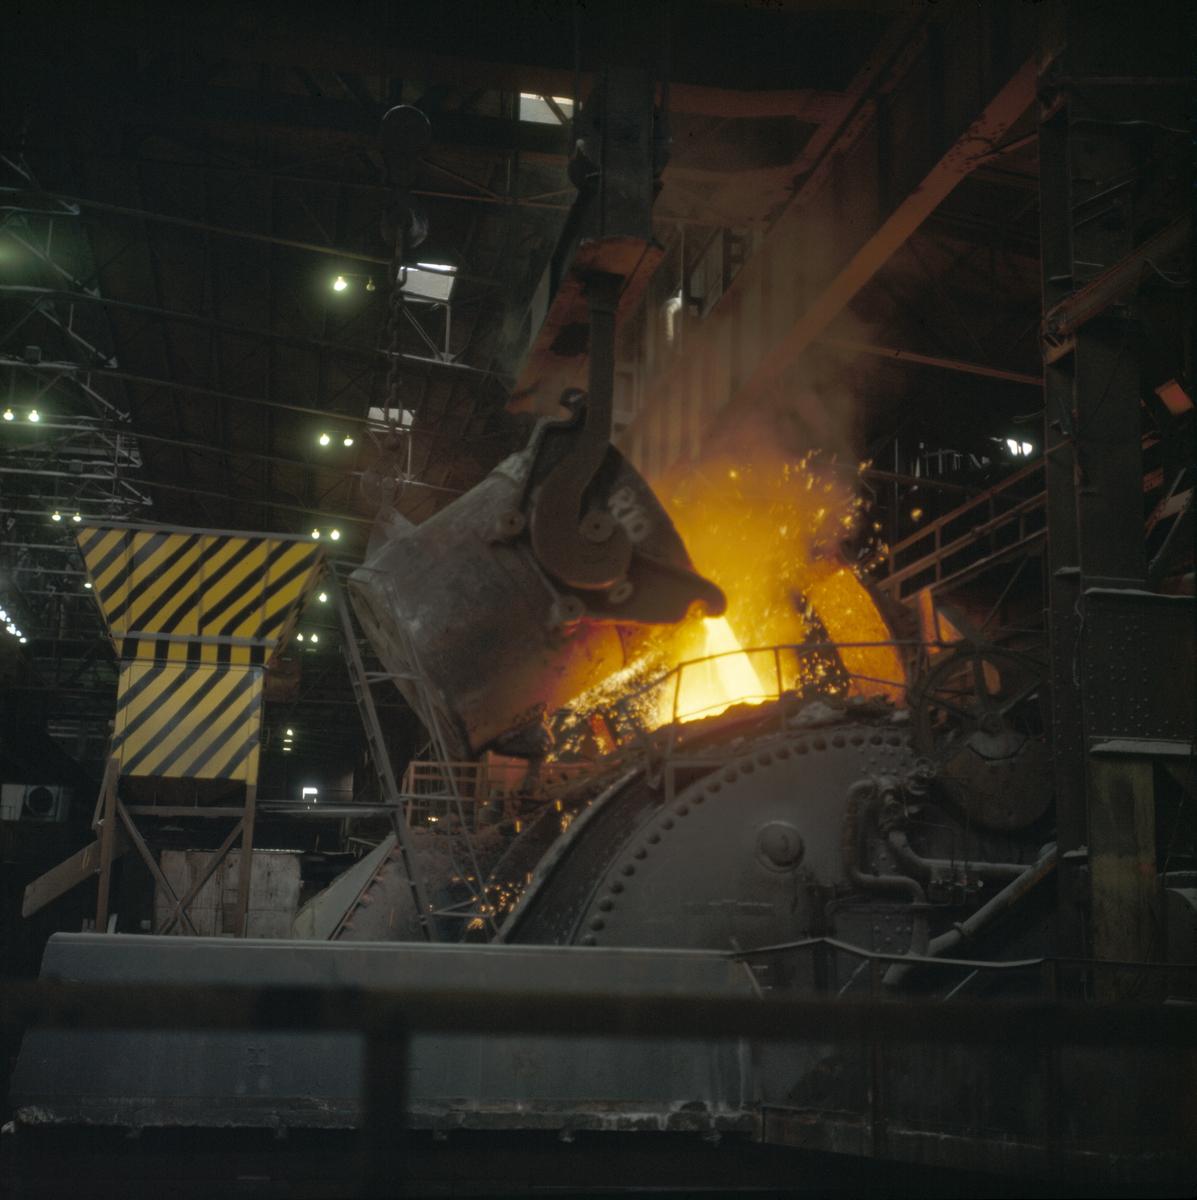 Foto av helling av flytende jern...Fra fotografens originalemballasje:.Norsk Jernverk, Mo i Rana.NN 71 - F/10